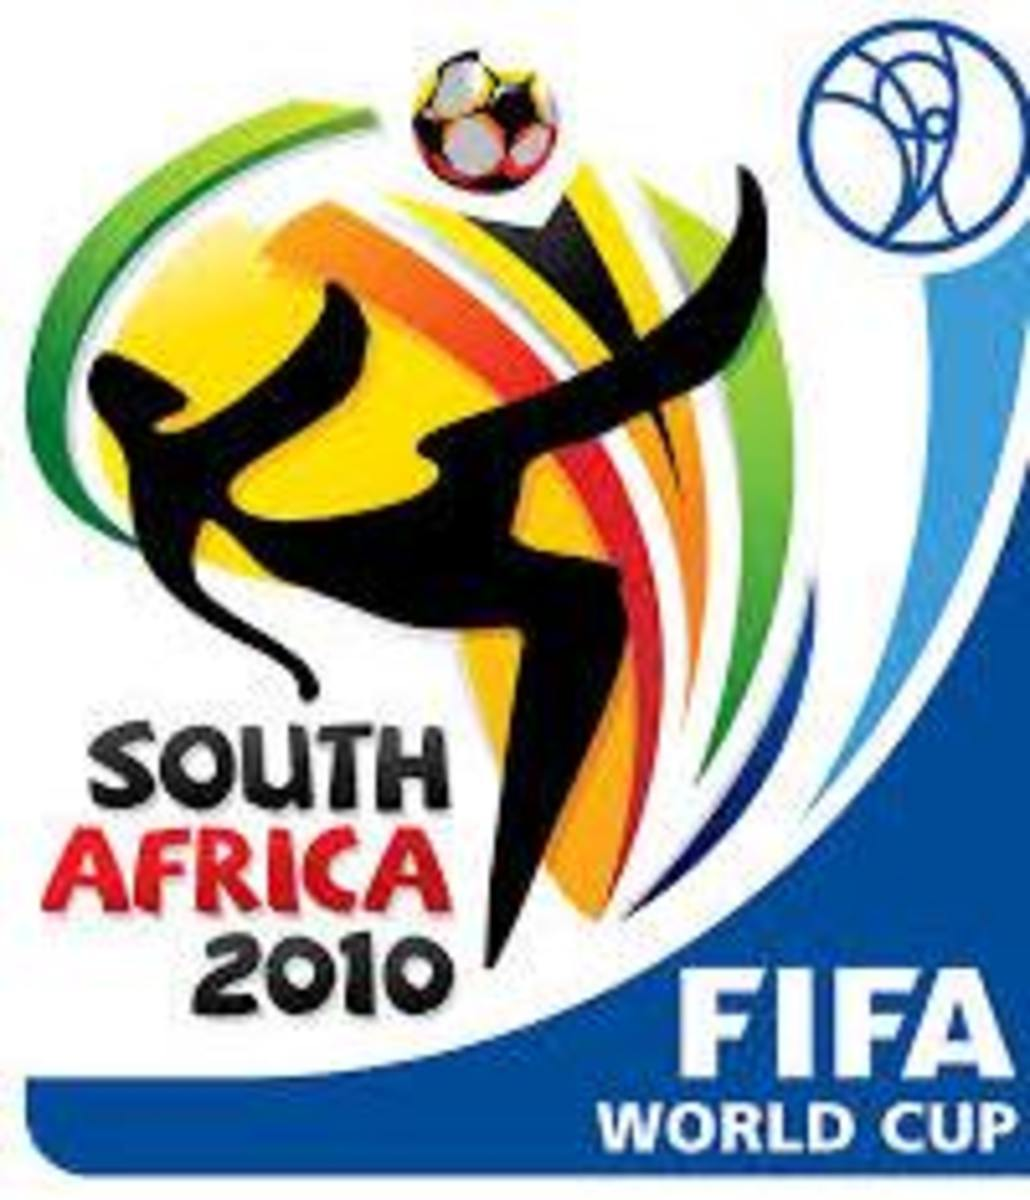 FIFA World Cup 2010 - a Funny Prediction